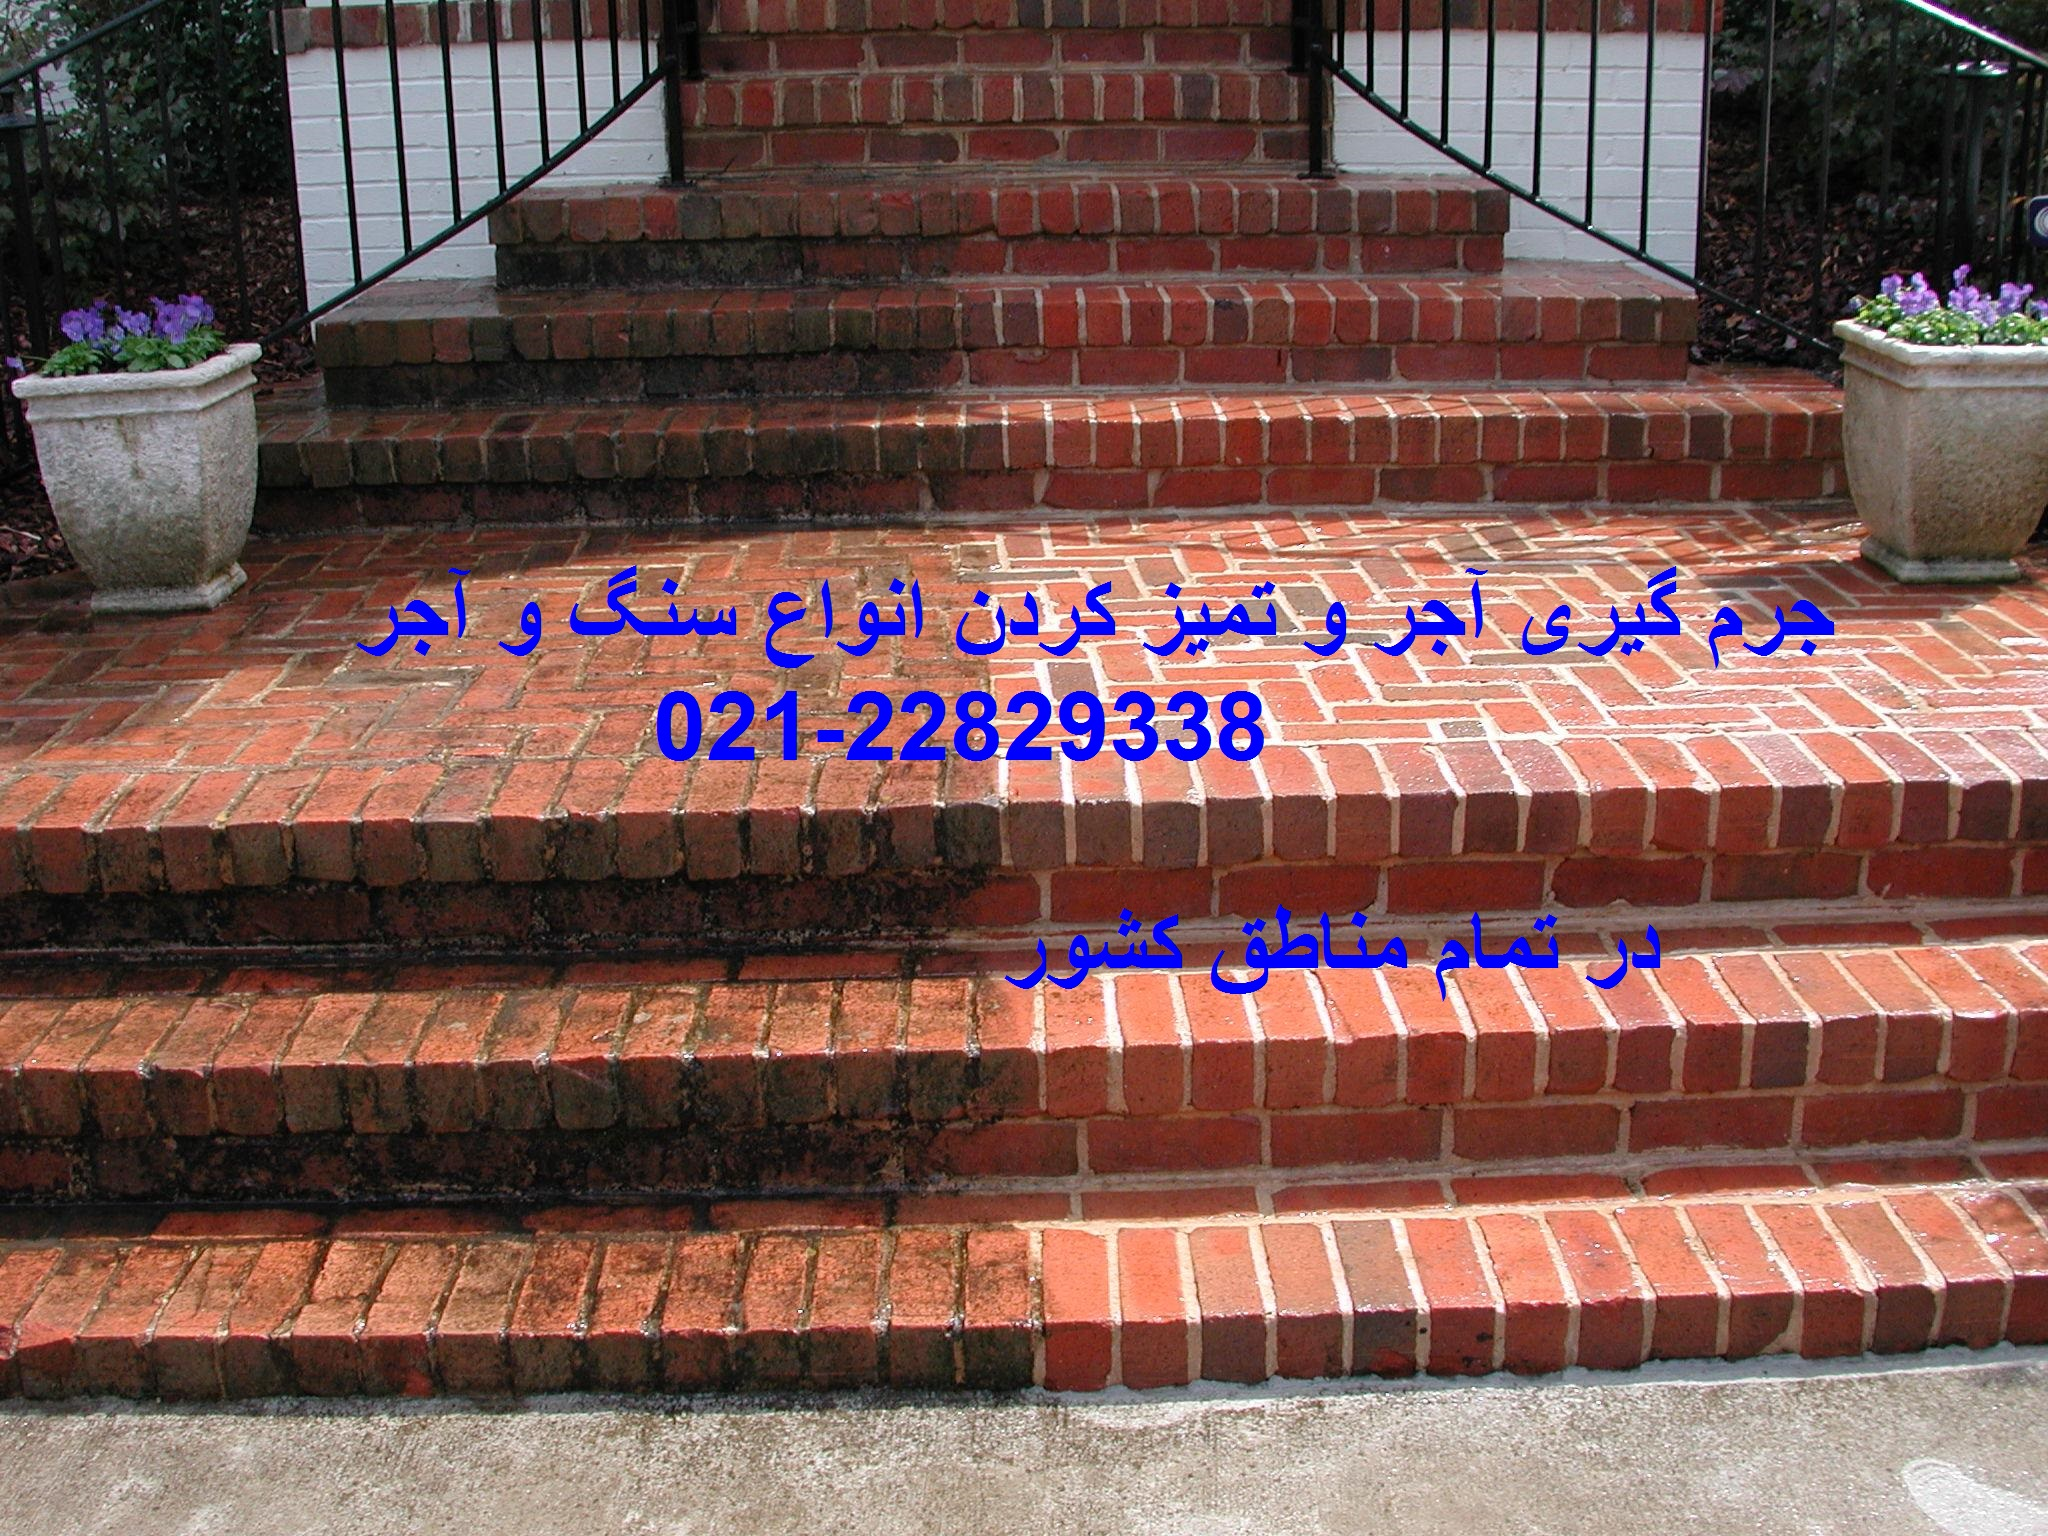 شستشوی سنگ جرم گیری سنگ ساب راه پله ساب پایگرد تمیز کردن راه پله لکه پله ماده لکه پله